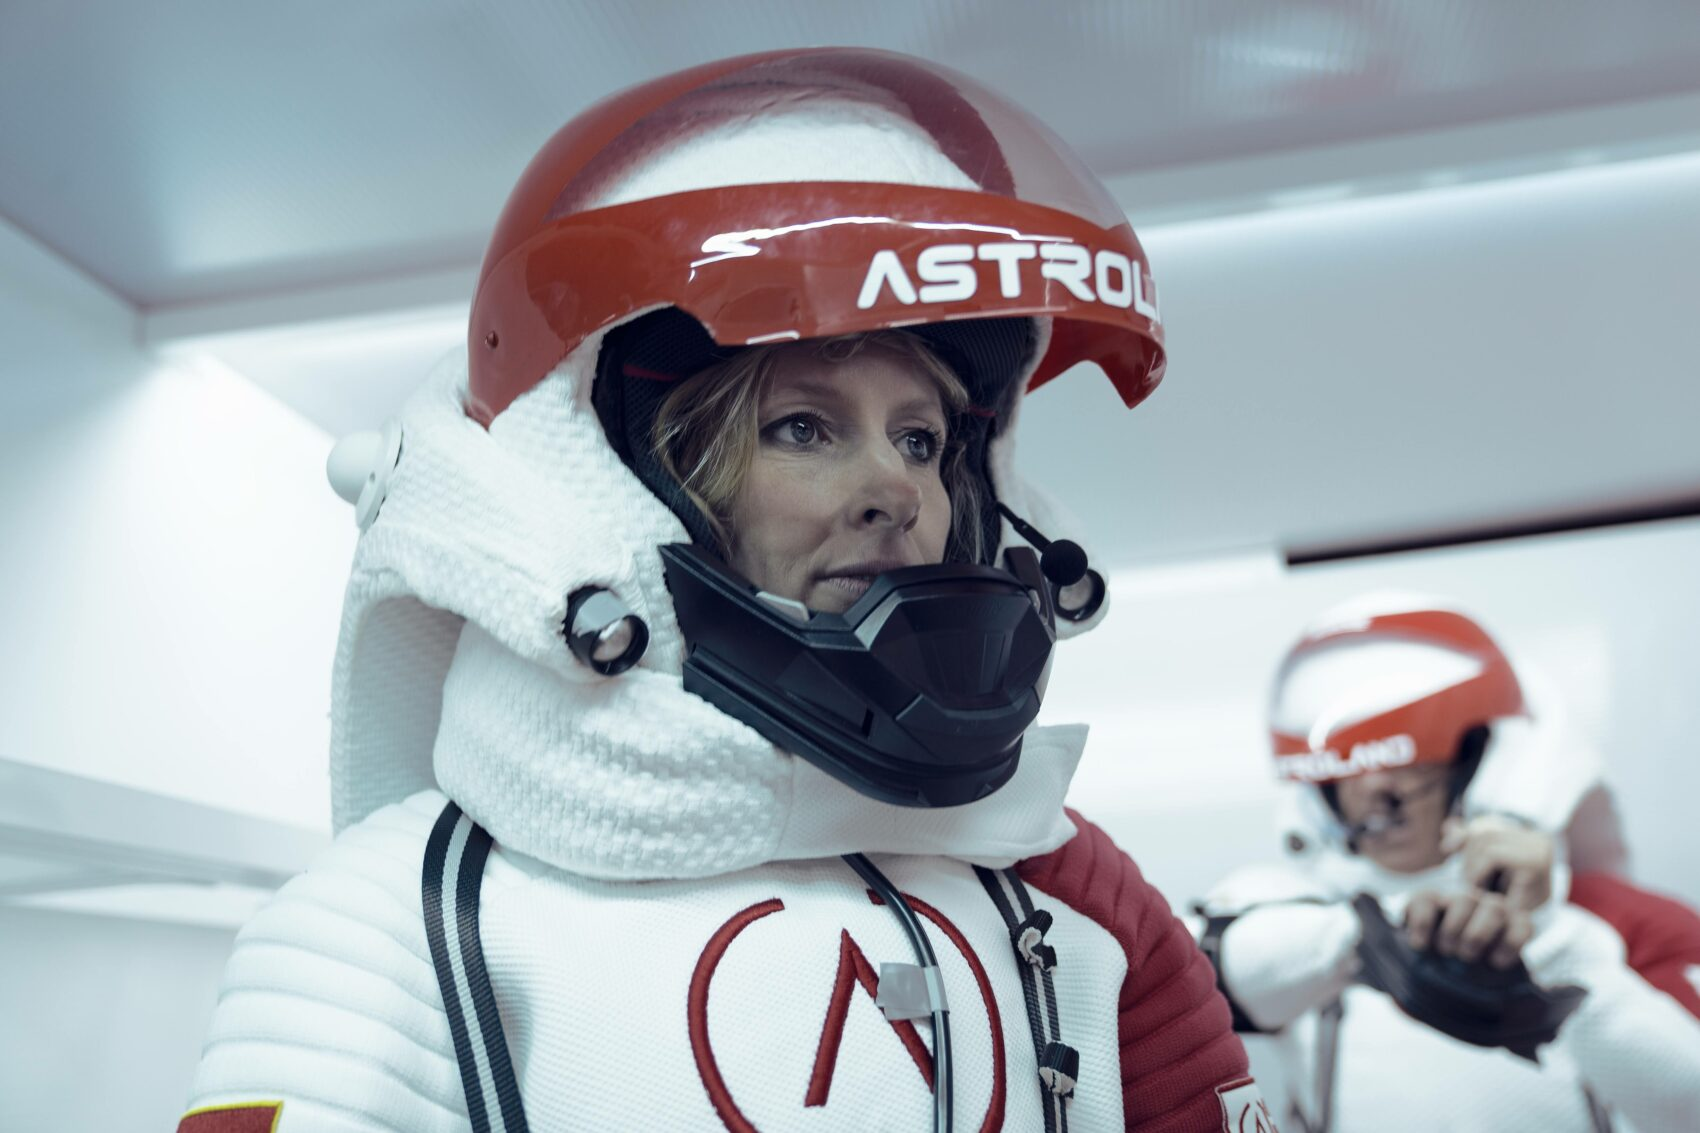 Astroland Life on Mars experience